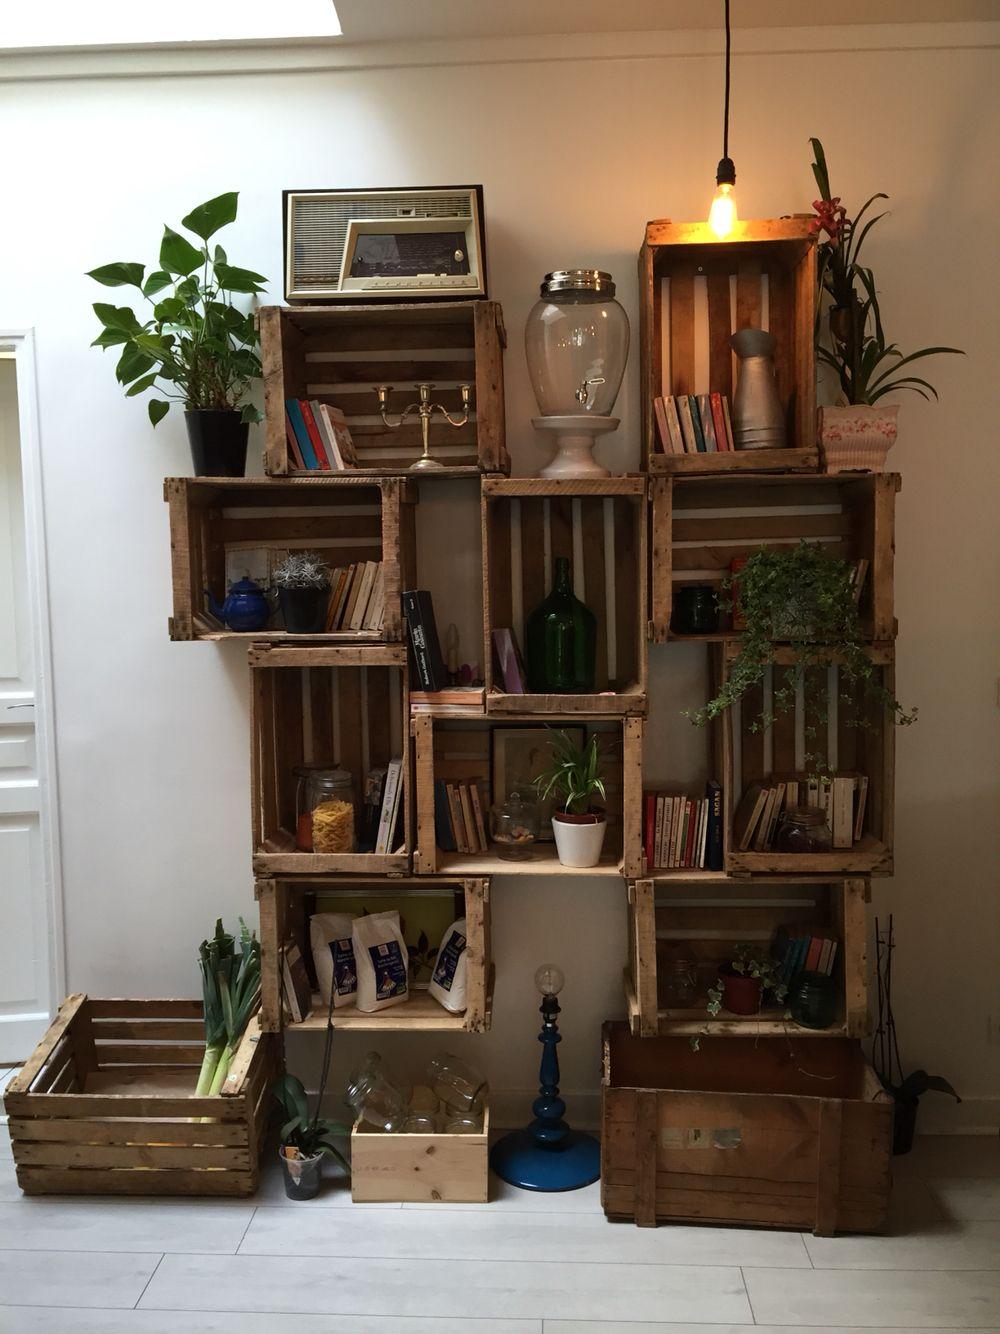 weinkisten als regal gesehen in paris do it your self pinterest organizing and interiors. Black Bedroom Furniture Sets. Home Design Ideas